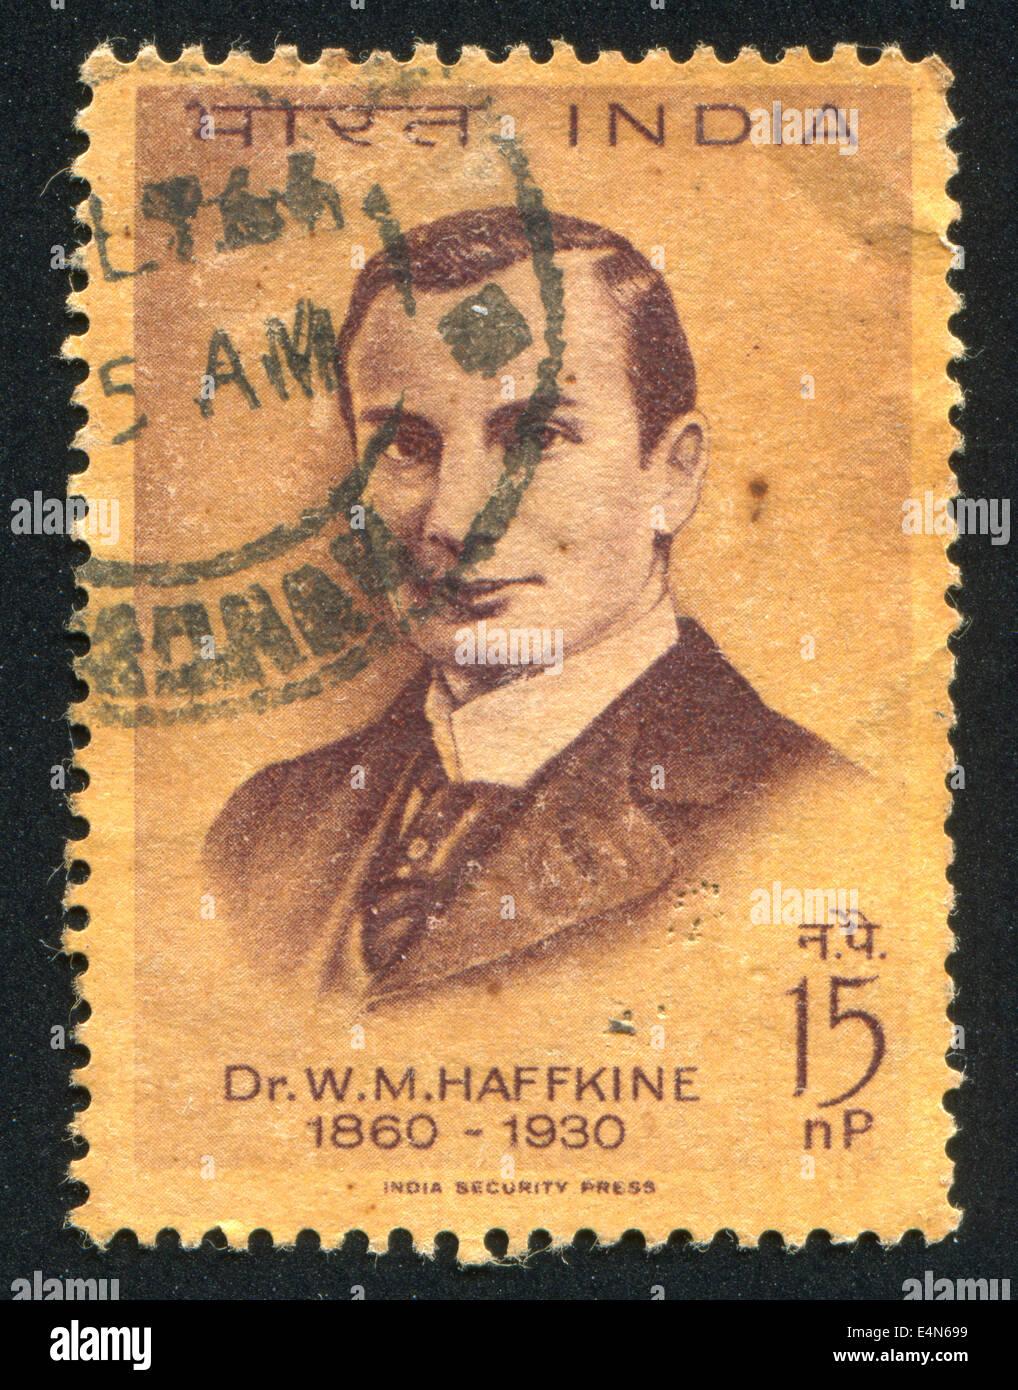 Waldemar Haffkine - Stock Image